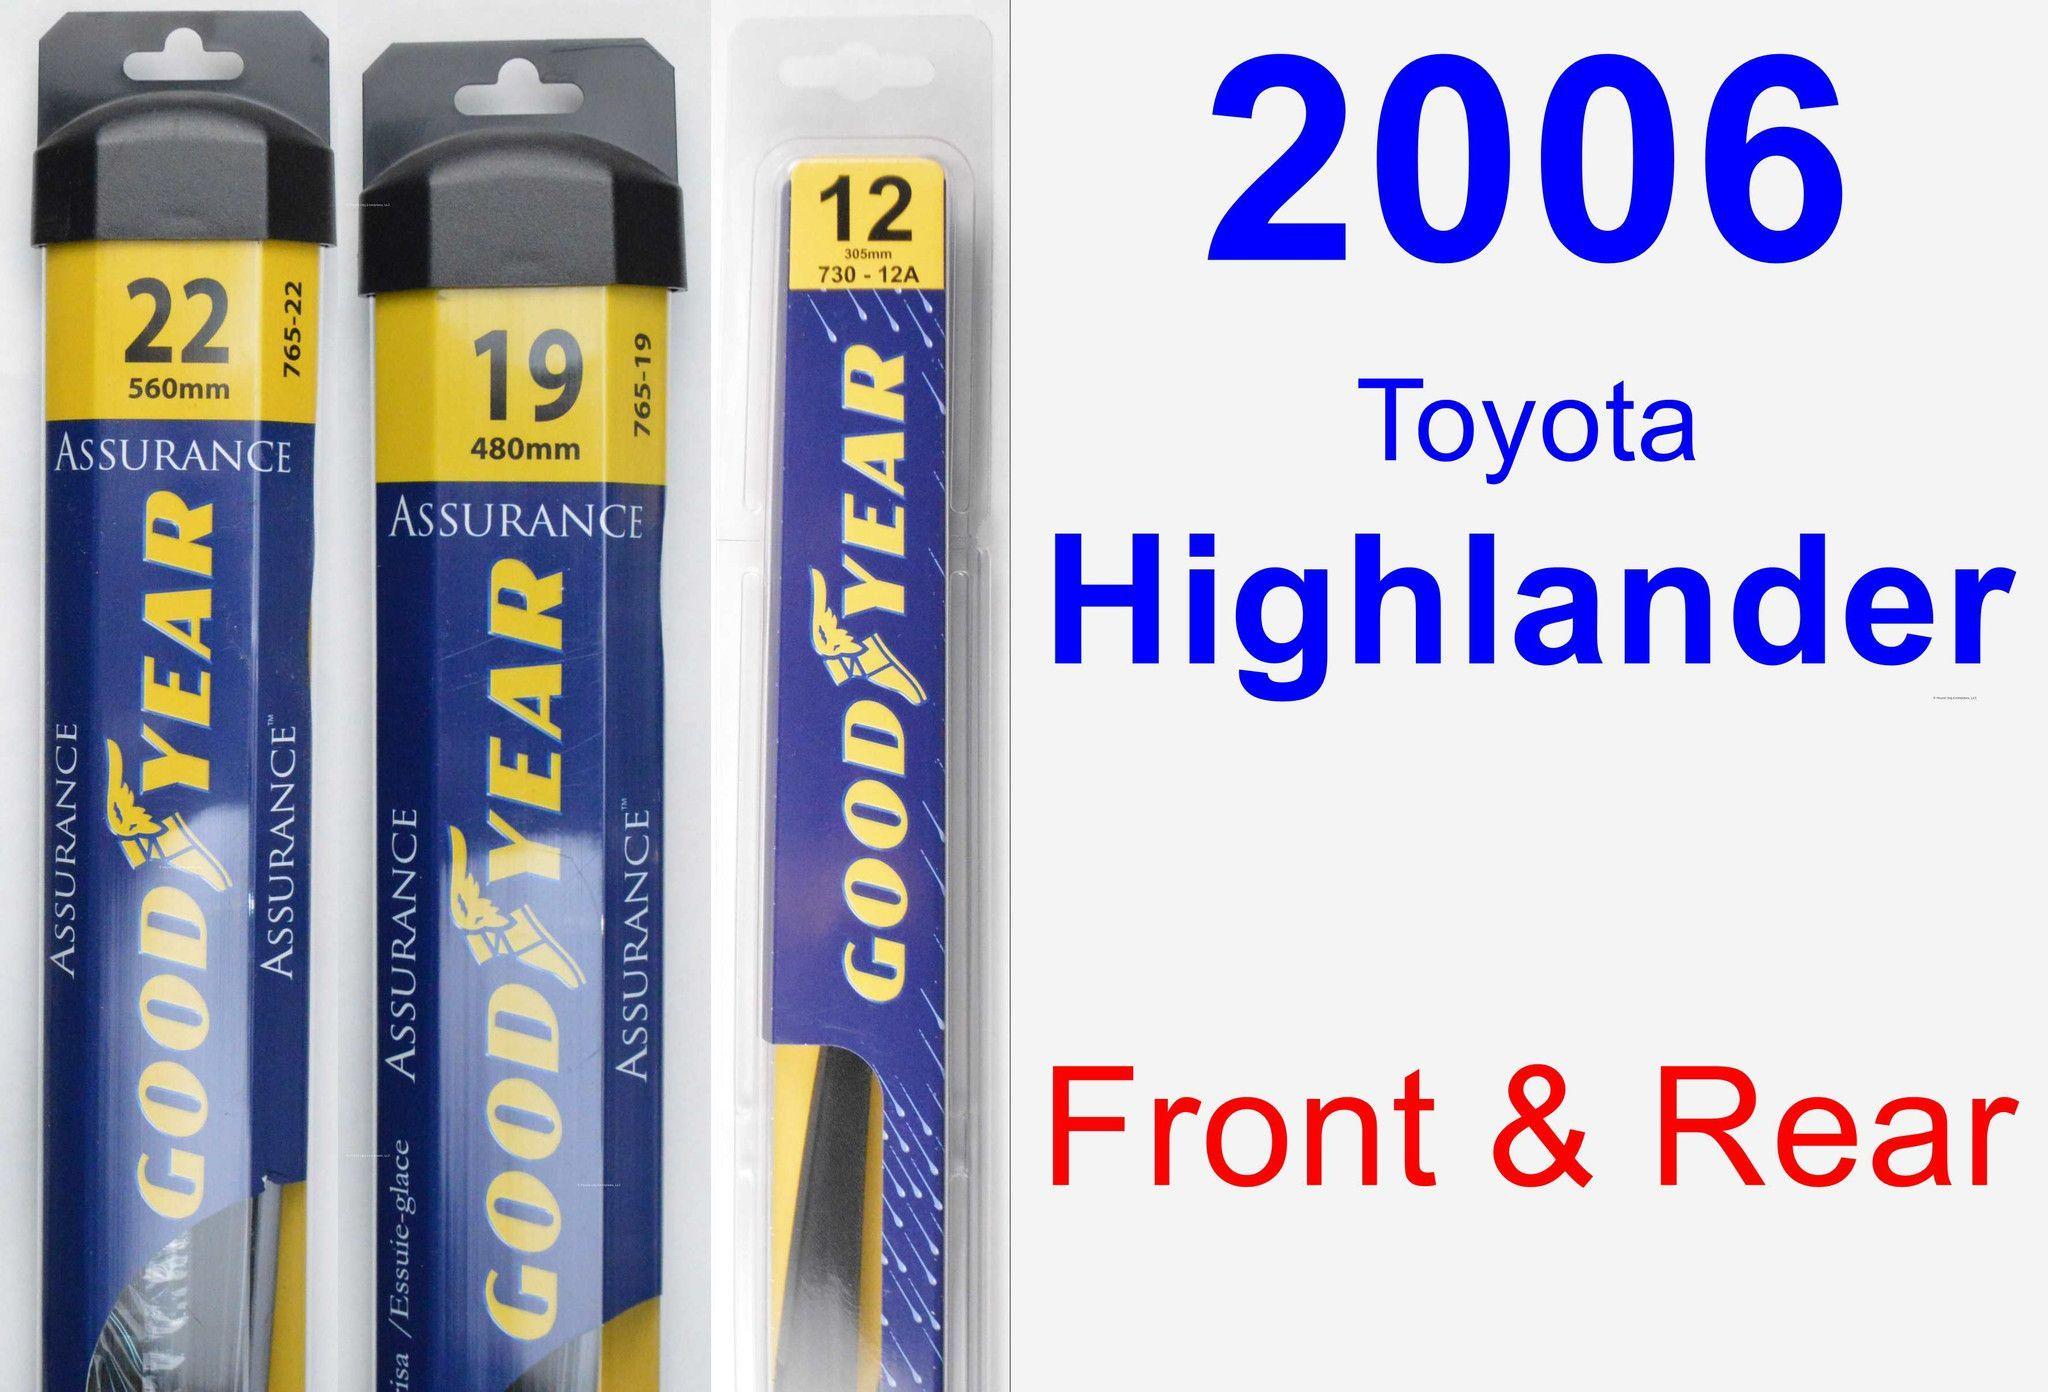 Front & Rear Wiper Blade Pack for 2006 Toyota Highlander